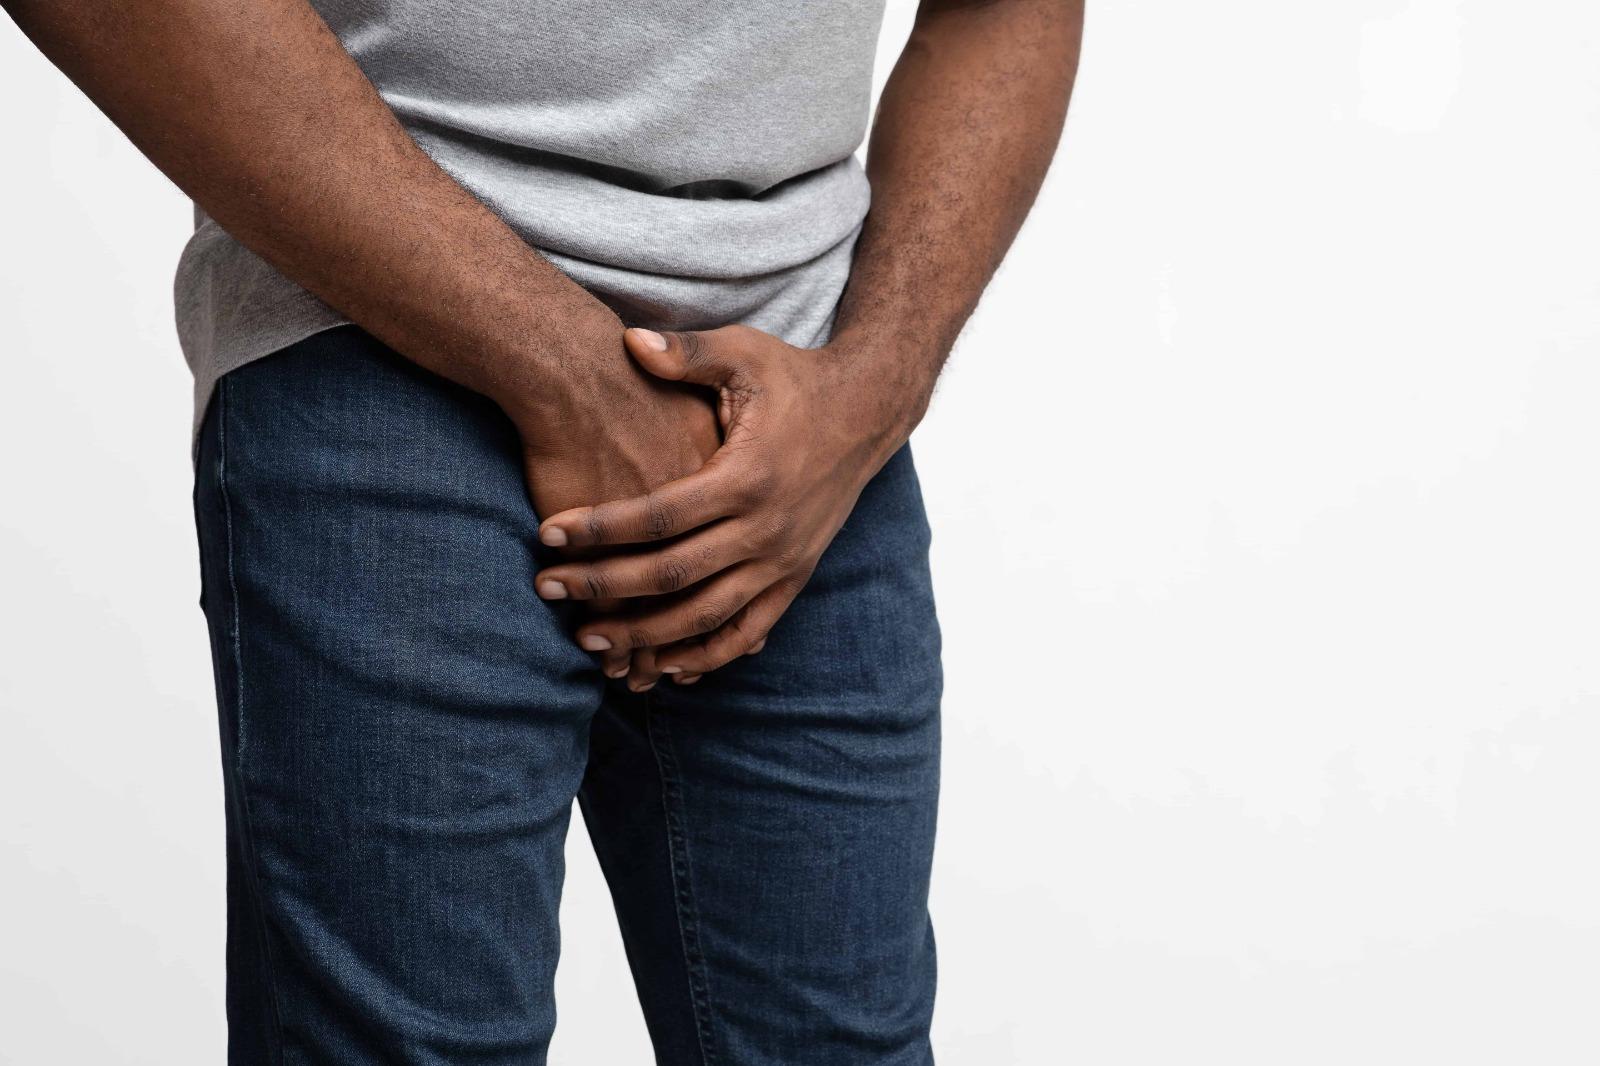 You are currently viewing קשירת צינורות הזרע – איך מתבצע הניתוח והאם הוא מסוכן?